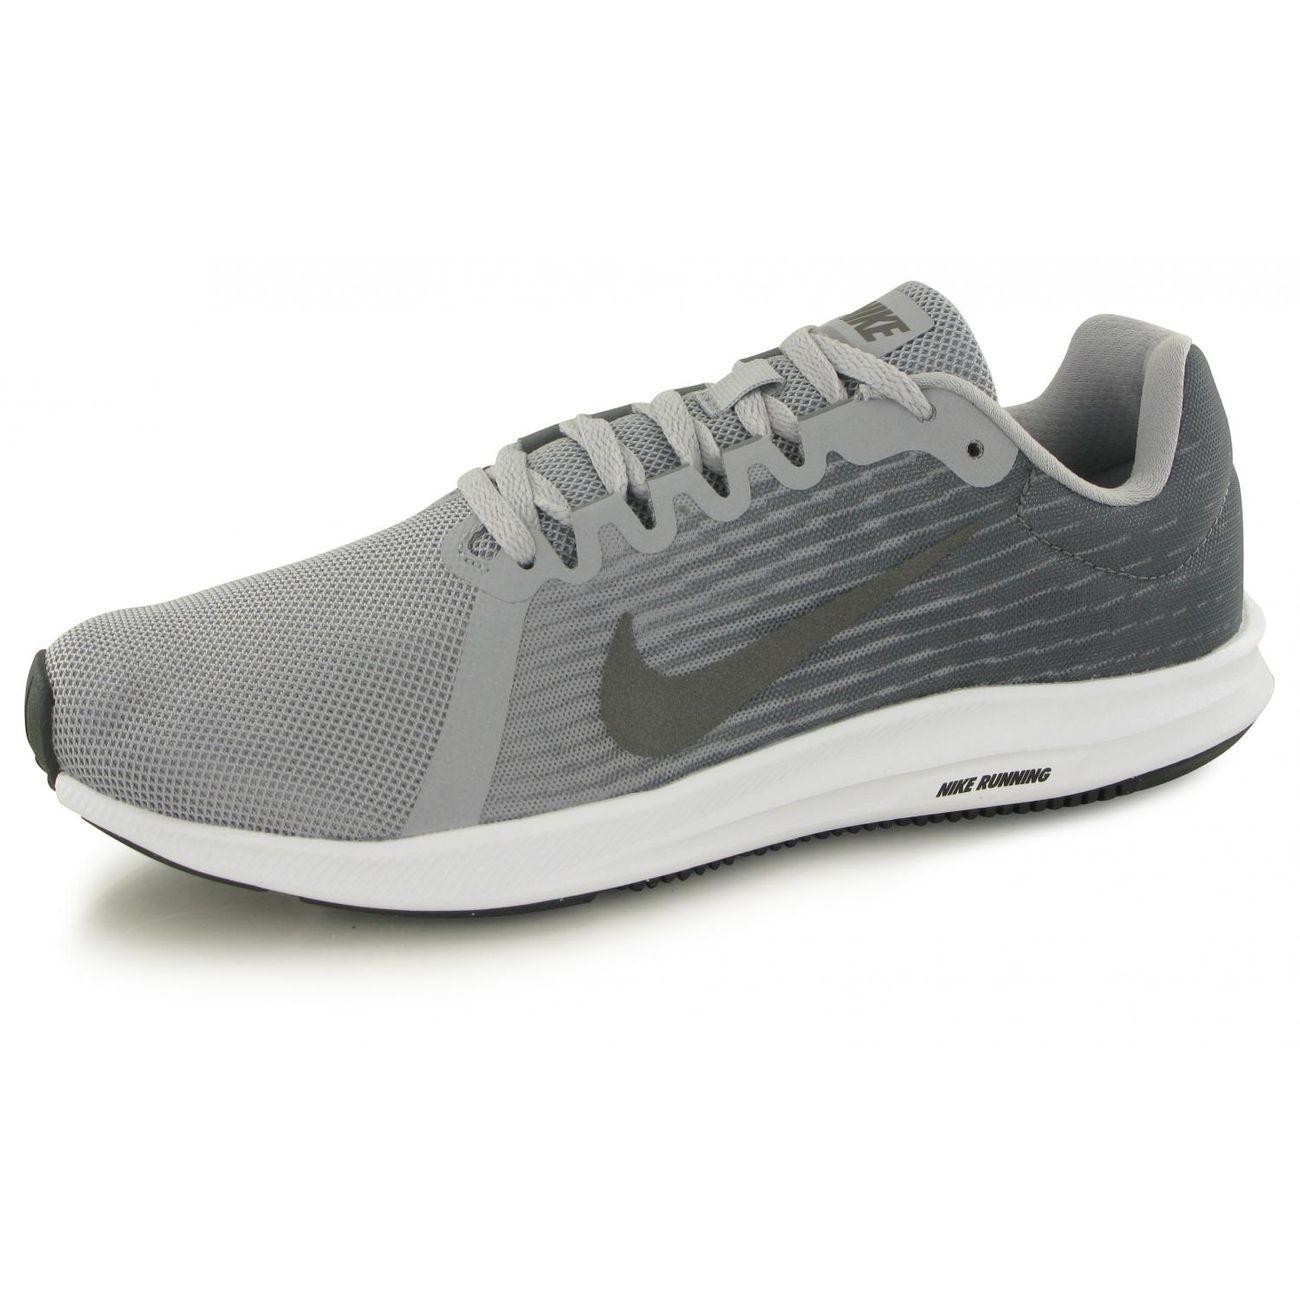 Nike Nike 8 Downshifter Nike 8 Nike 8 Downshifter Downshifter 0wm8Nn